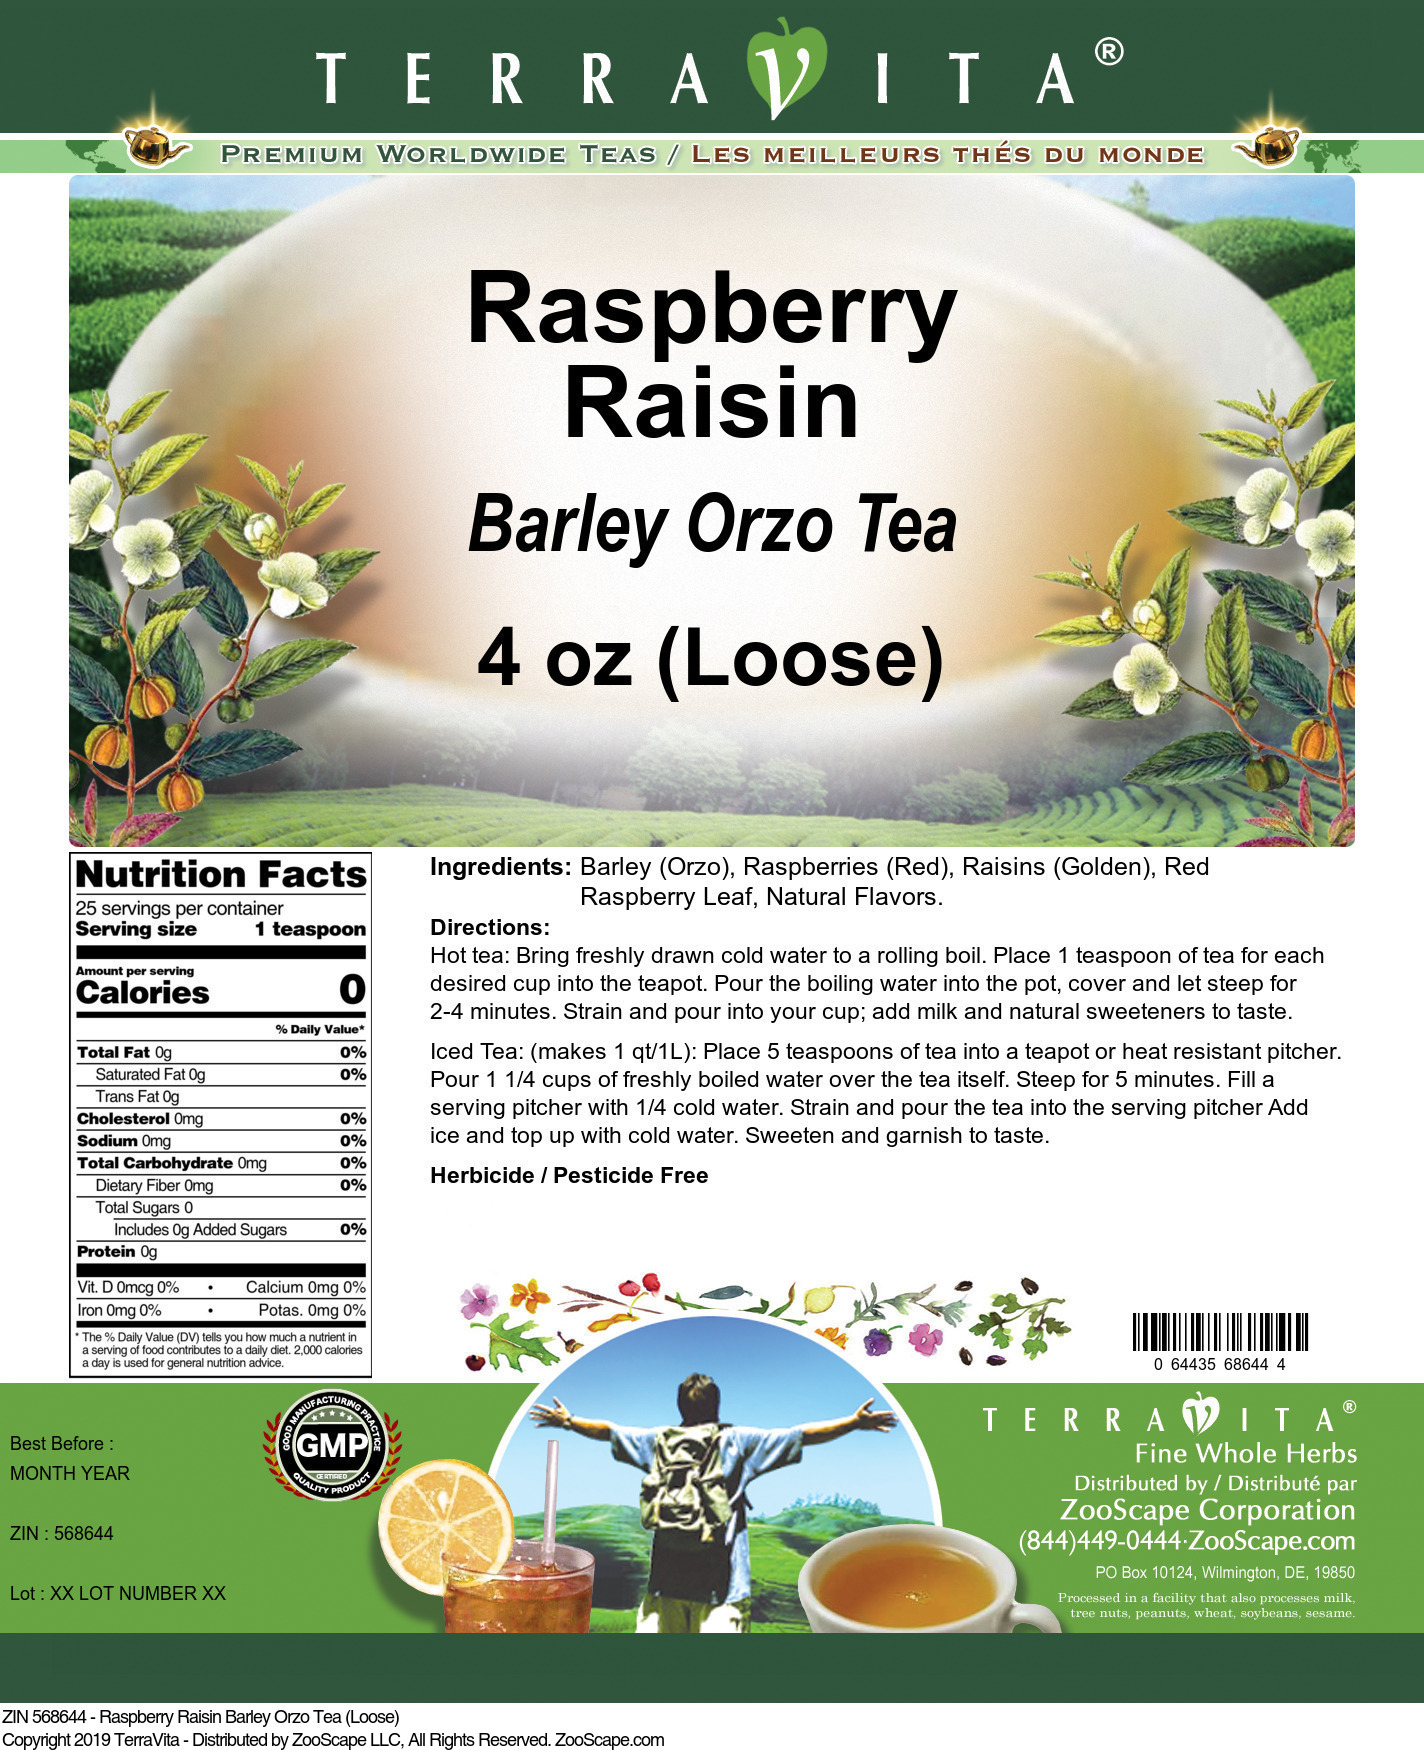 Raspberry Raisin Barley Orzo Tea (Loose)